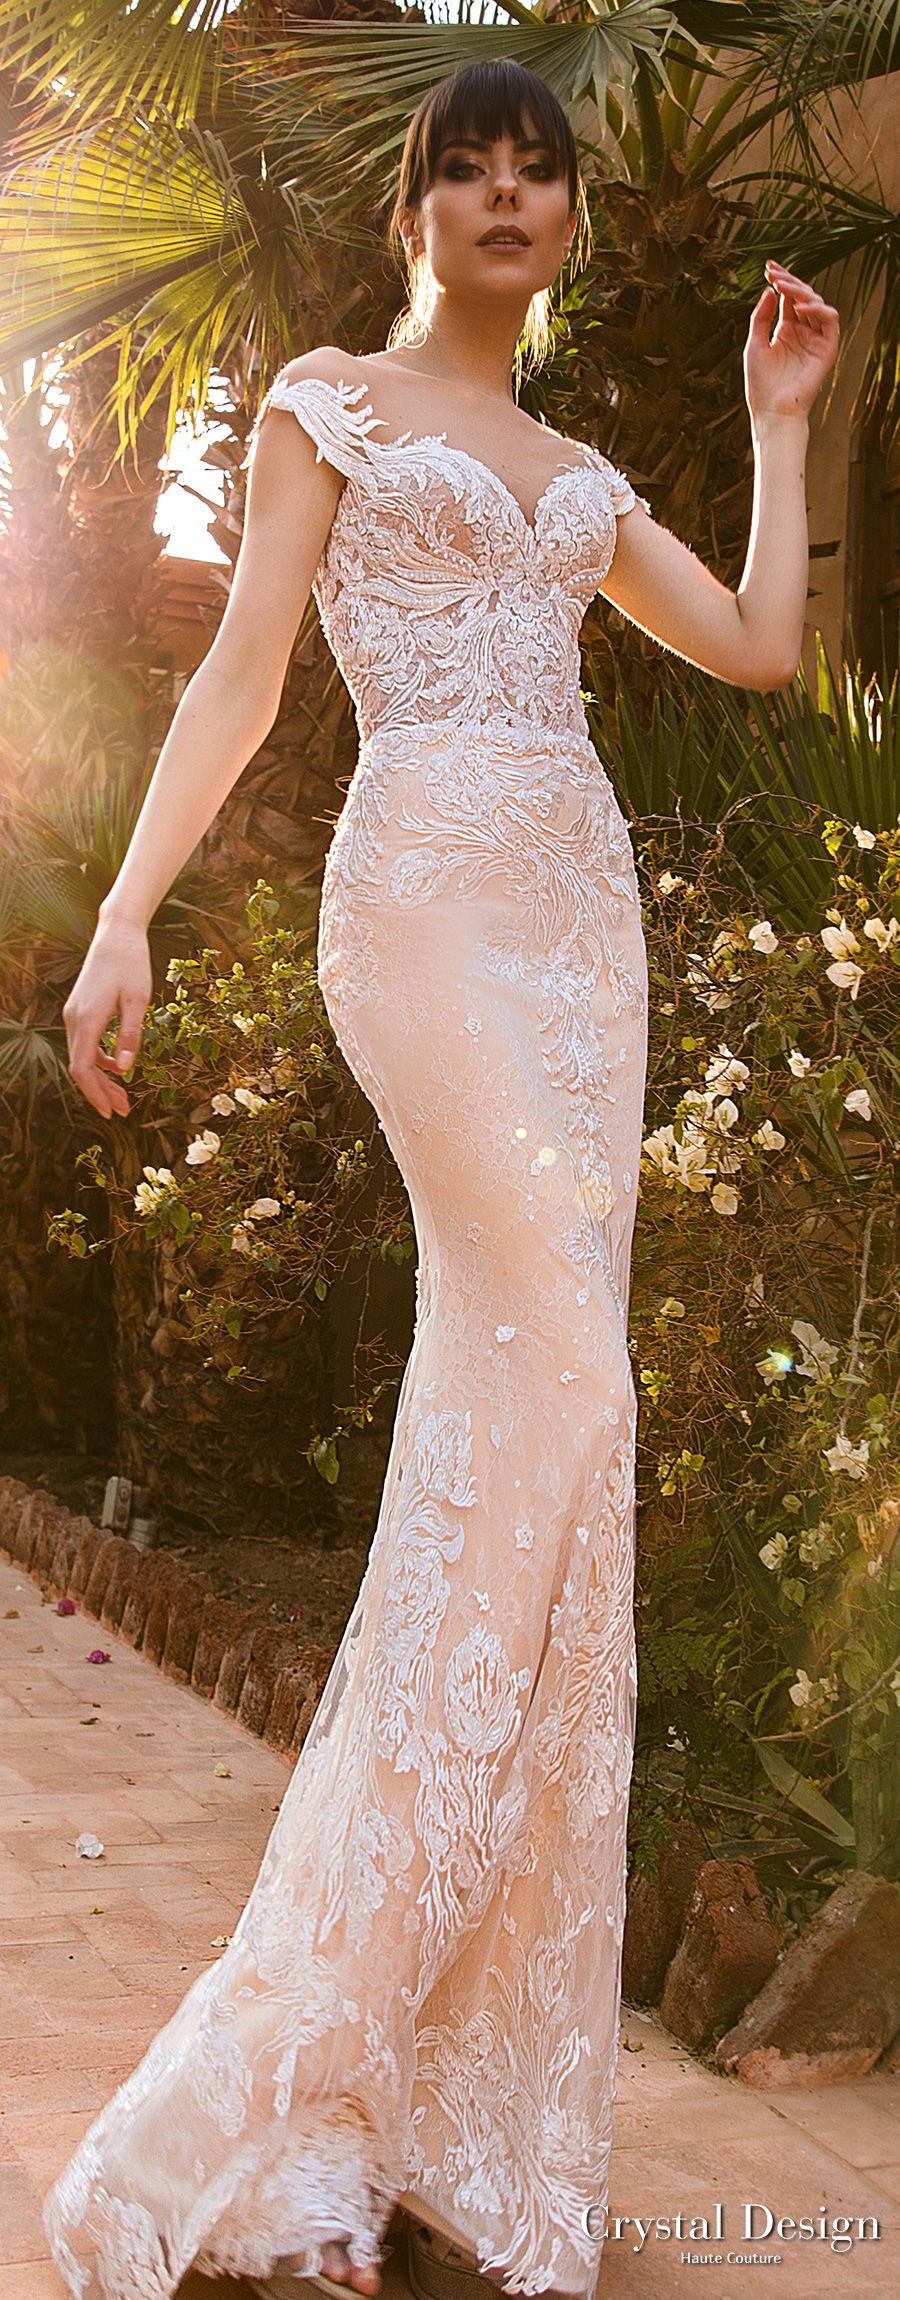 Crystal design 2018 wedding dresses royal garden for Butterfly back wedding dress